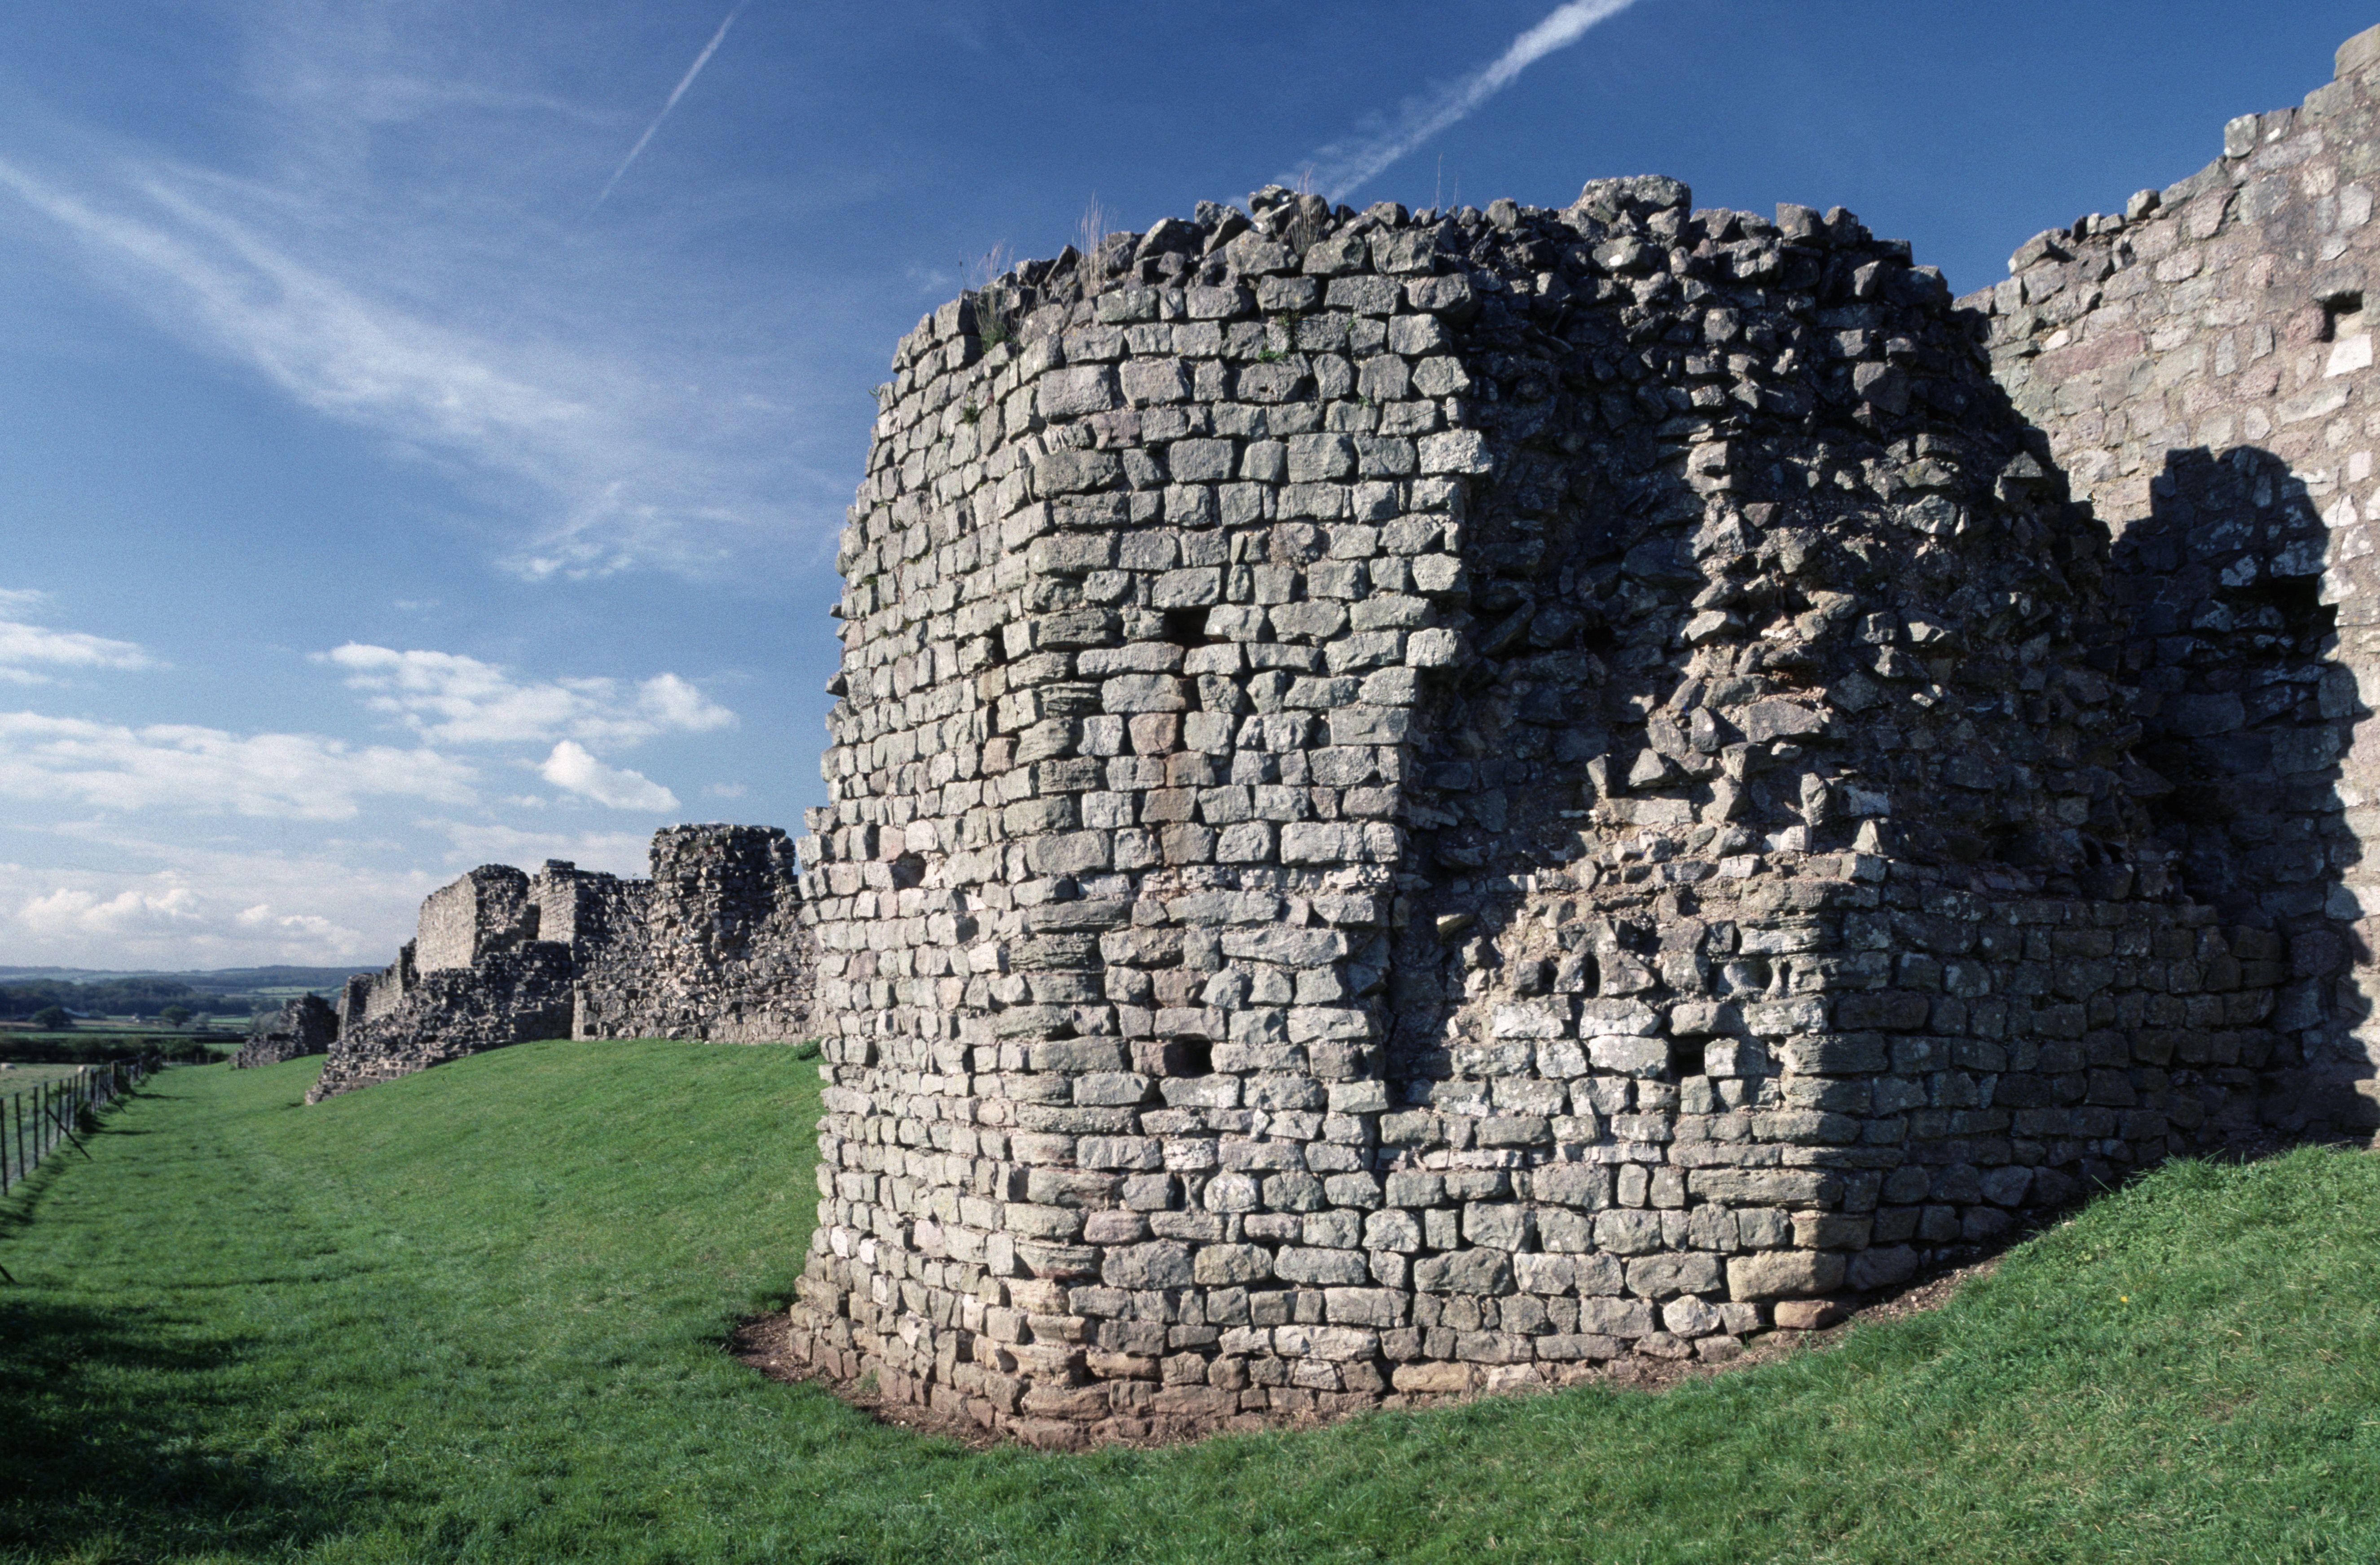 Ruins of the Roman walls of Venta Silurum, Caerwent, Wales, United Kingdom, Roman civilization, 1st-6th century AD